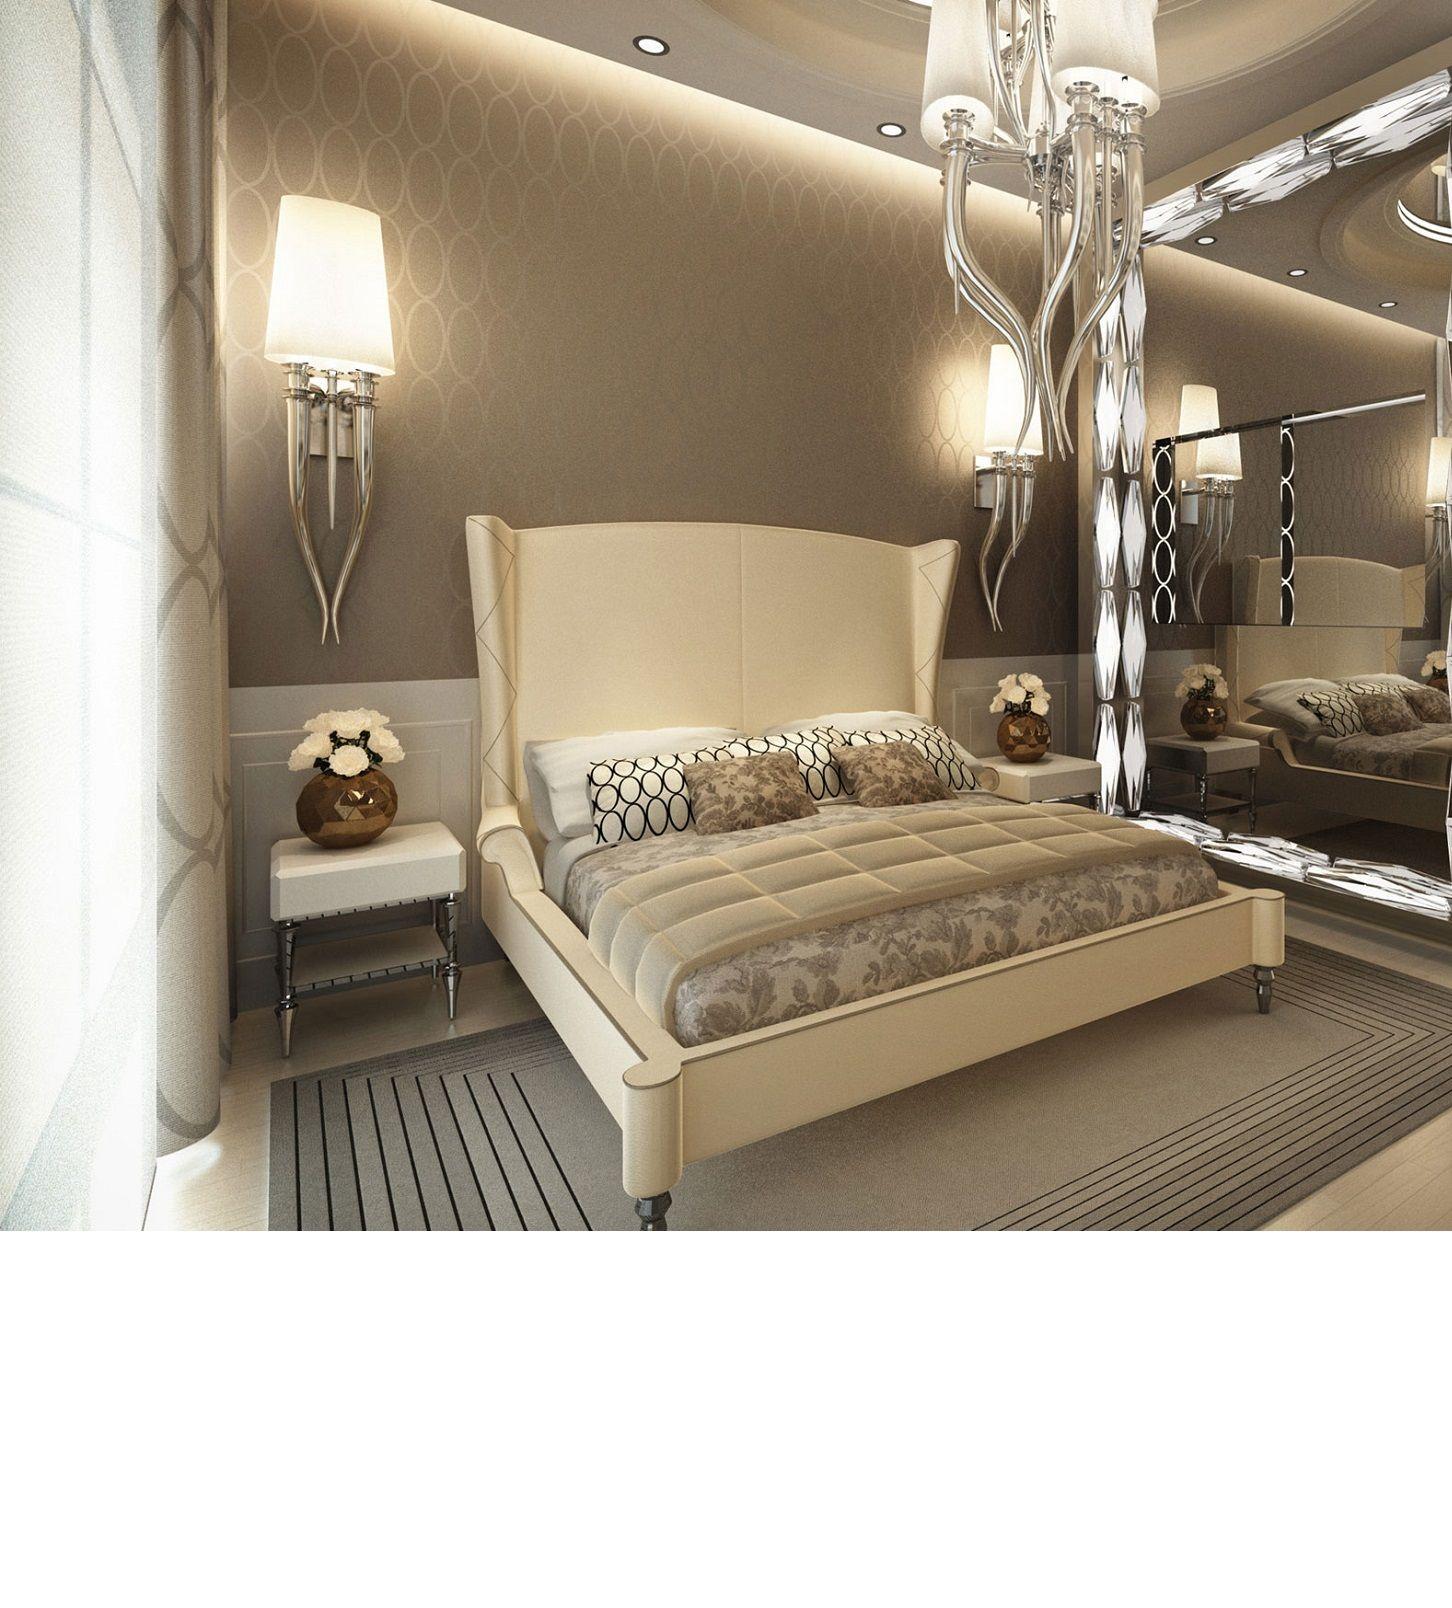 Luxury Bedroom Interior Design Inspiring 5 Star Hotel Penthouse Suites Luxurious Custom An Luxurious Bedrooms Luxury Bedroom Furniture Luxury Interior Design